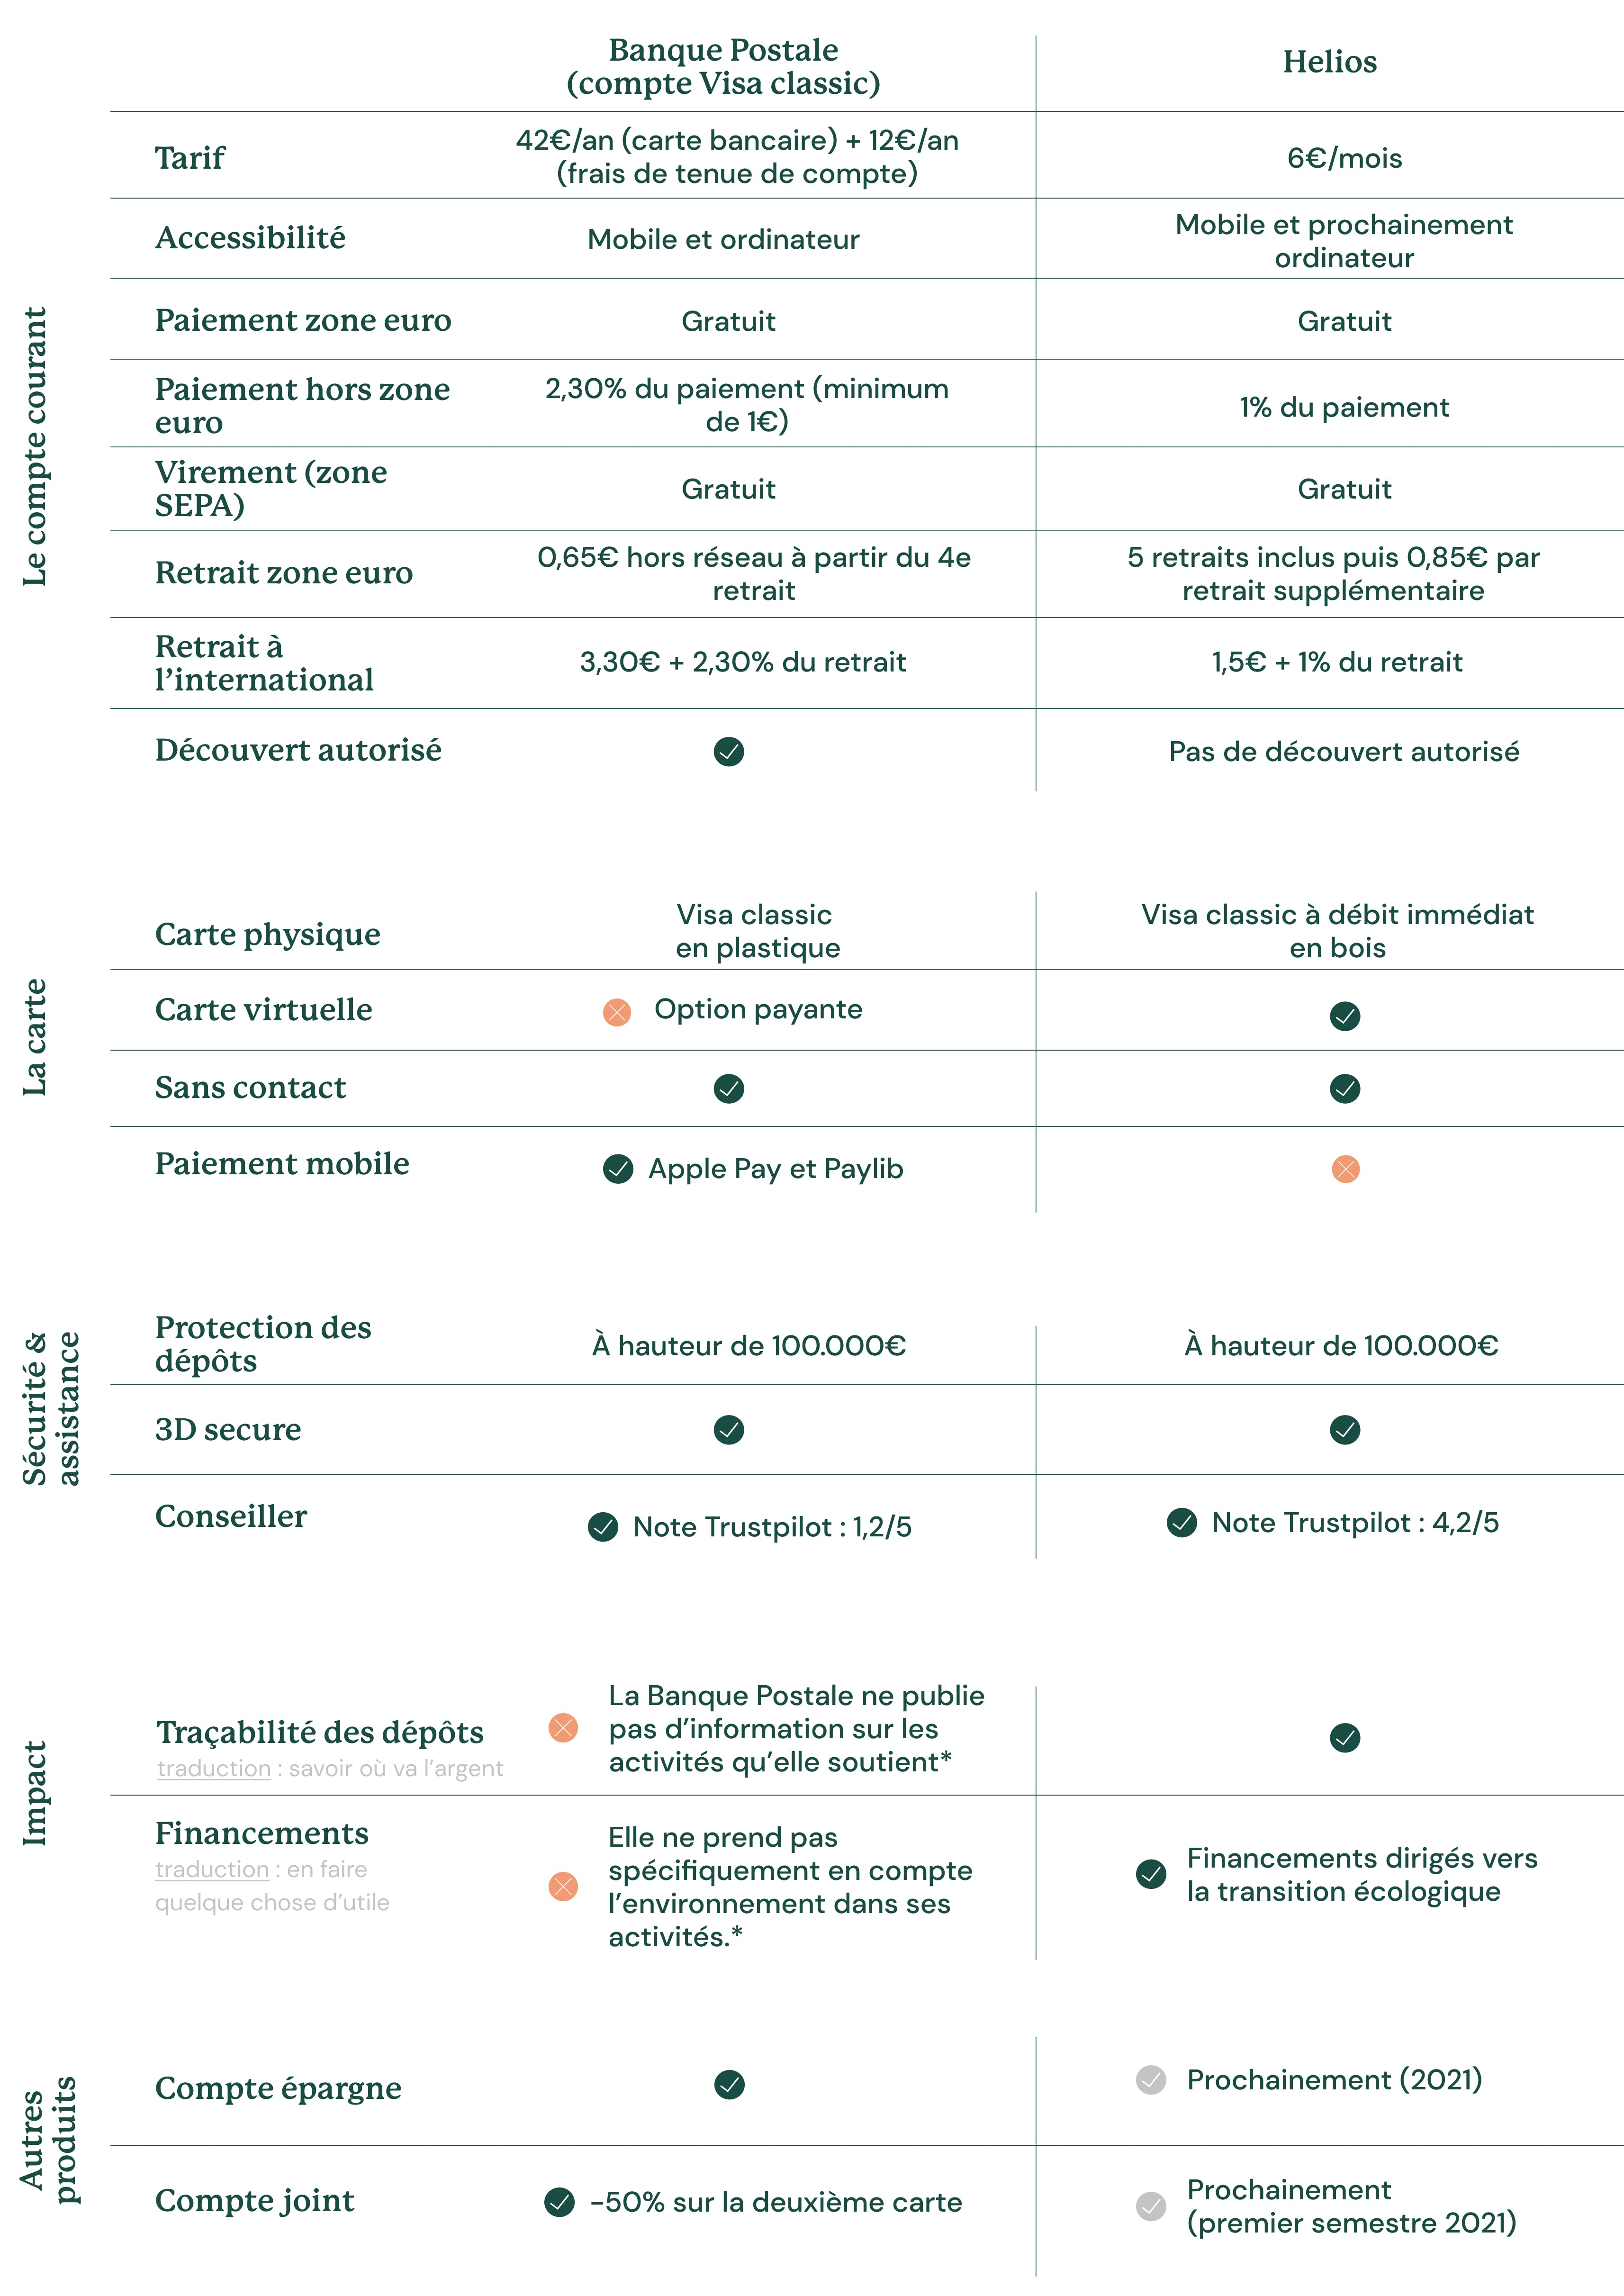 Helios vs. La Banque Postale (compte Visa classic)